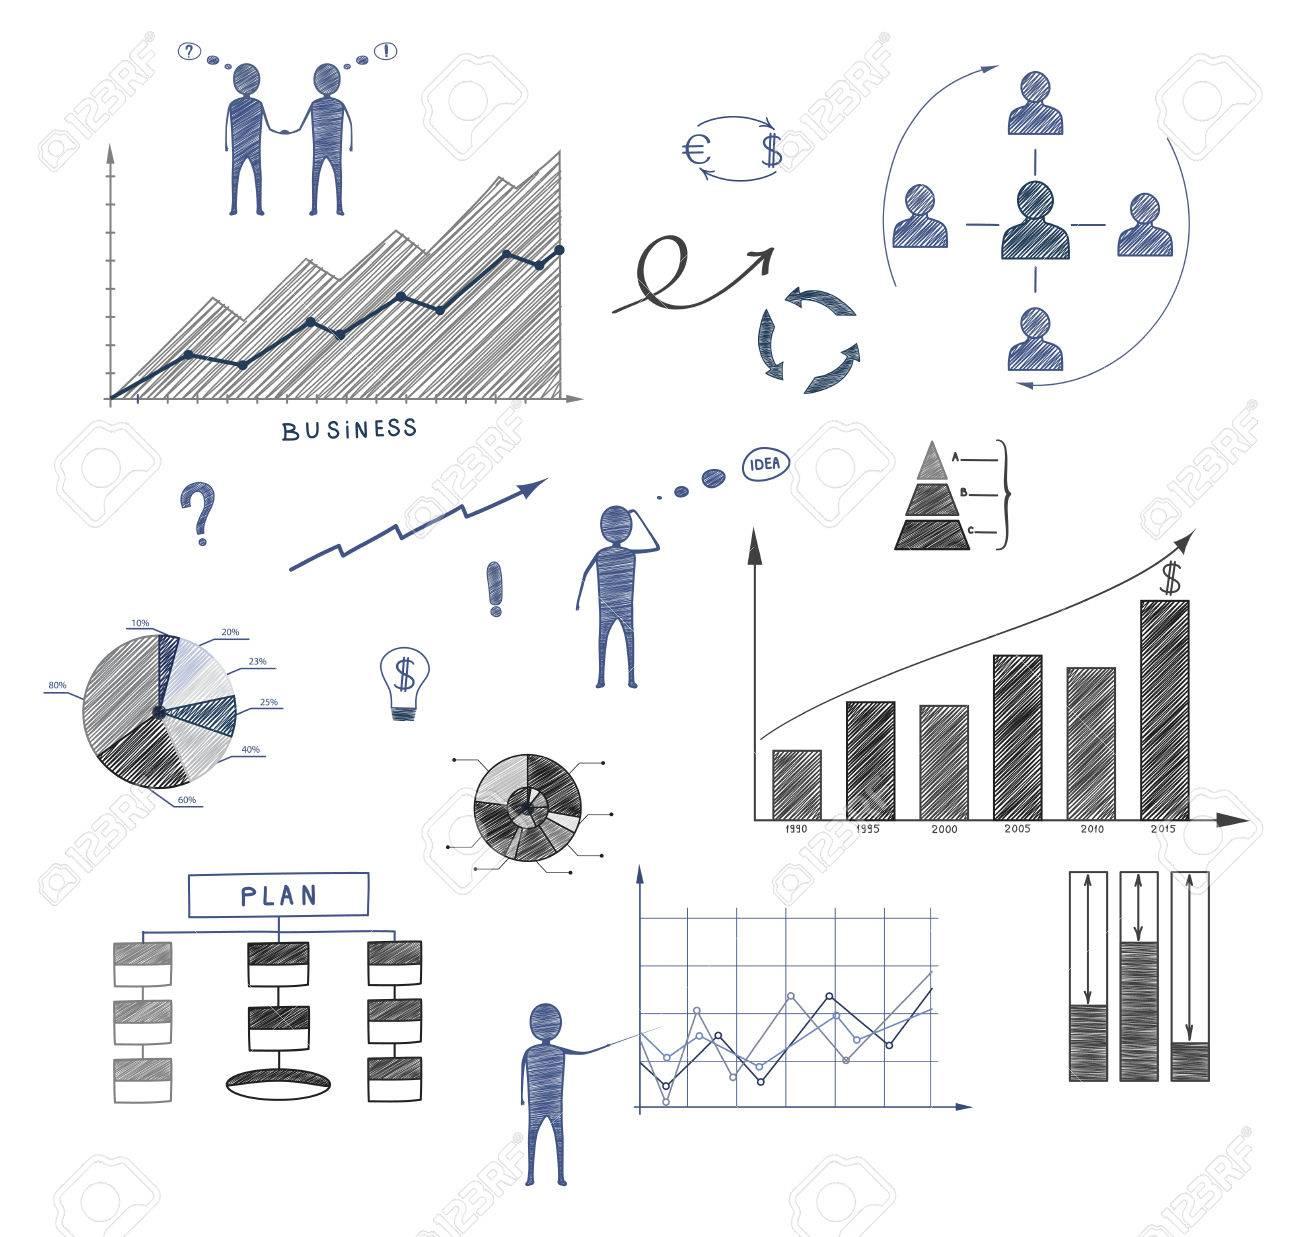 Financials for a business plan